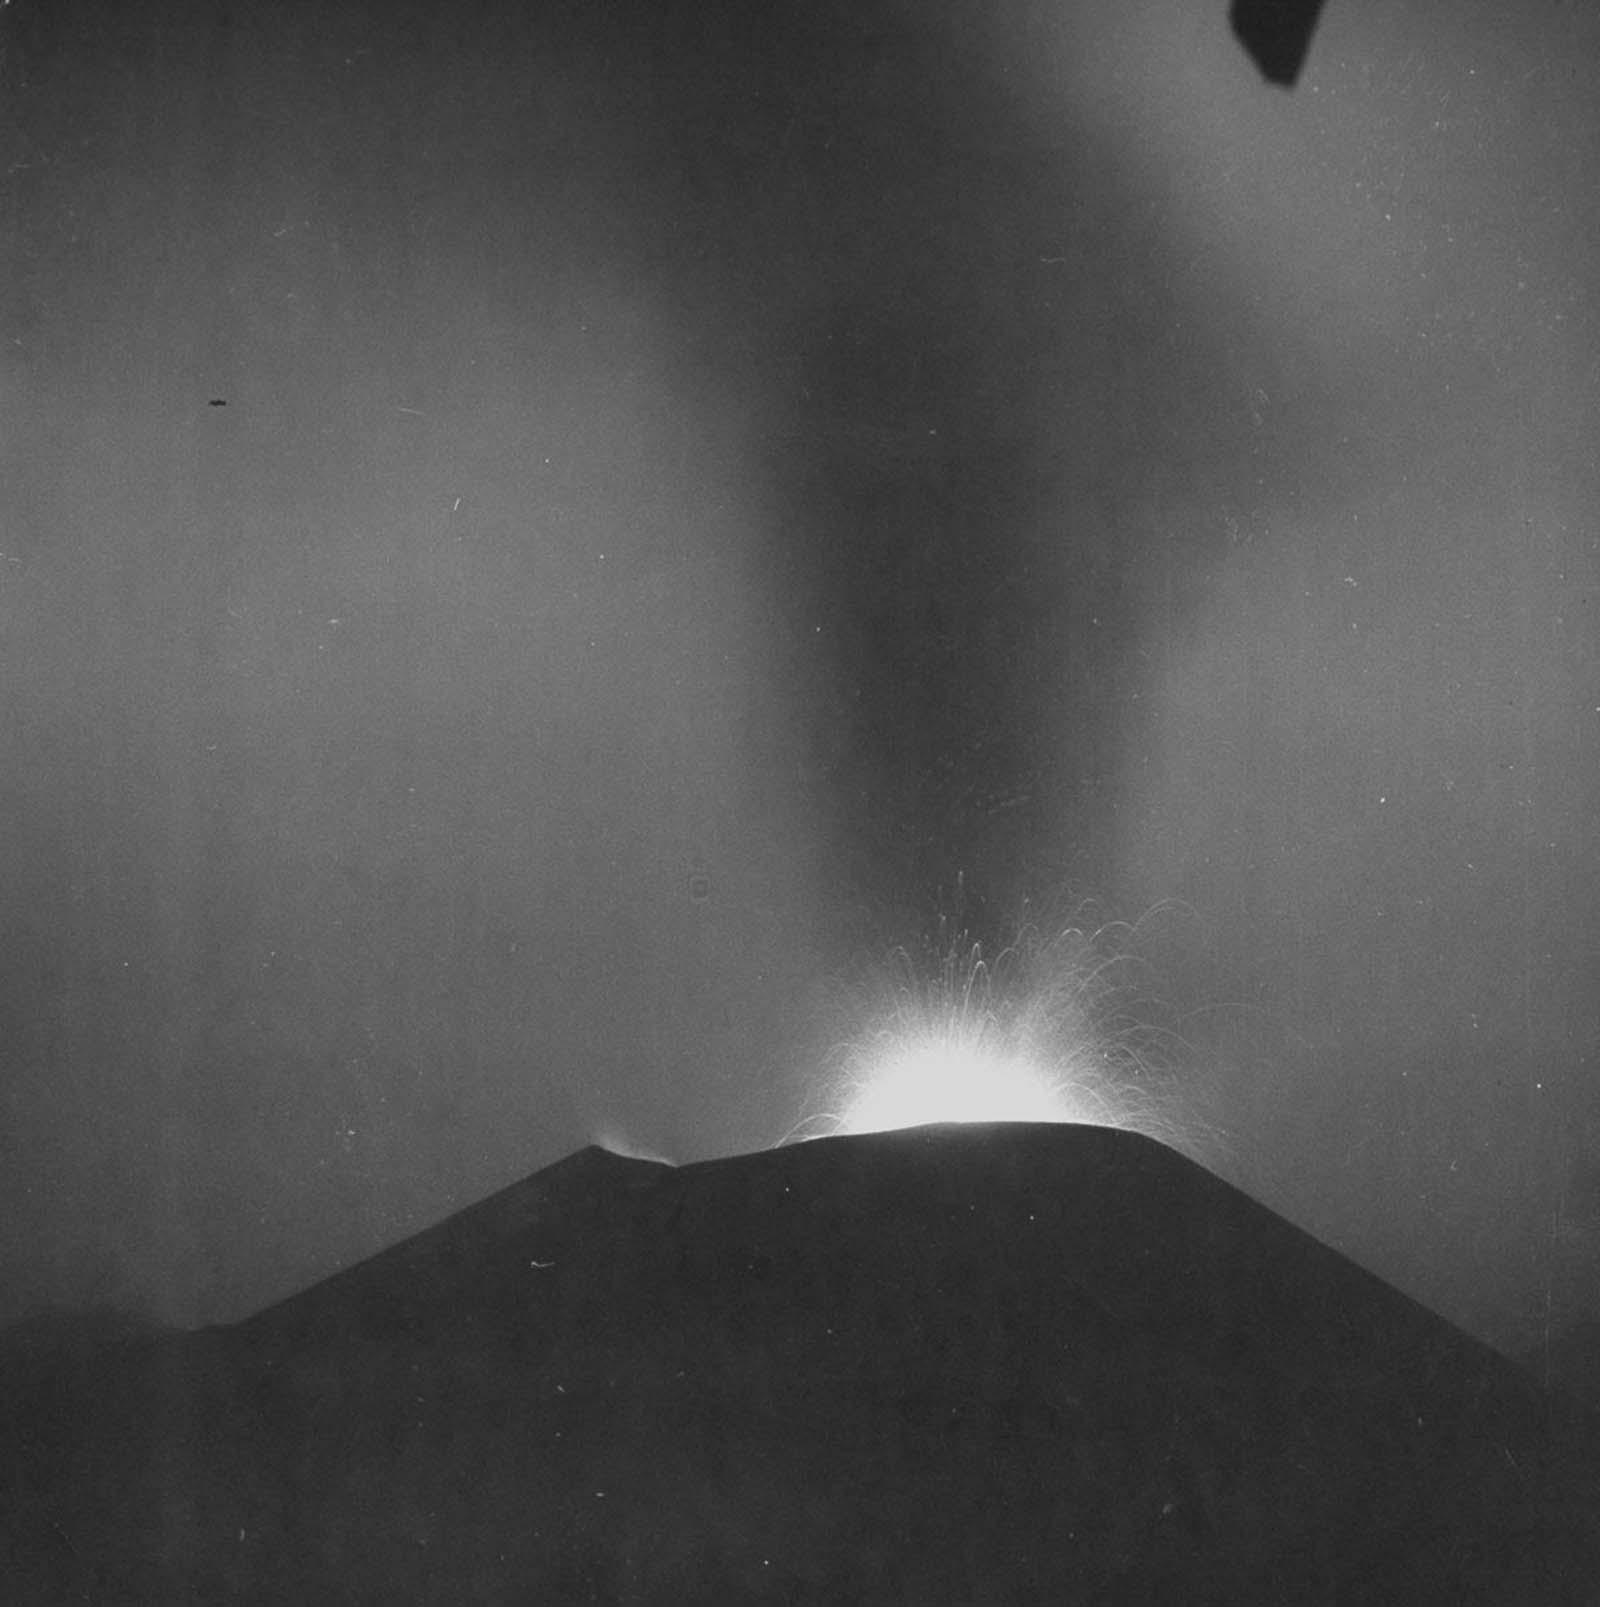 Paricutin volcano eruption photographs